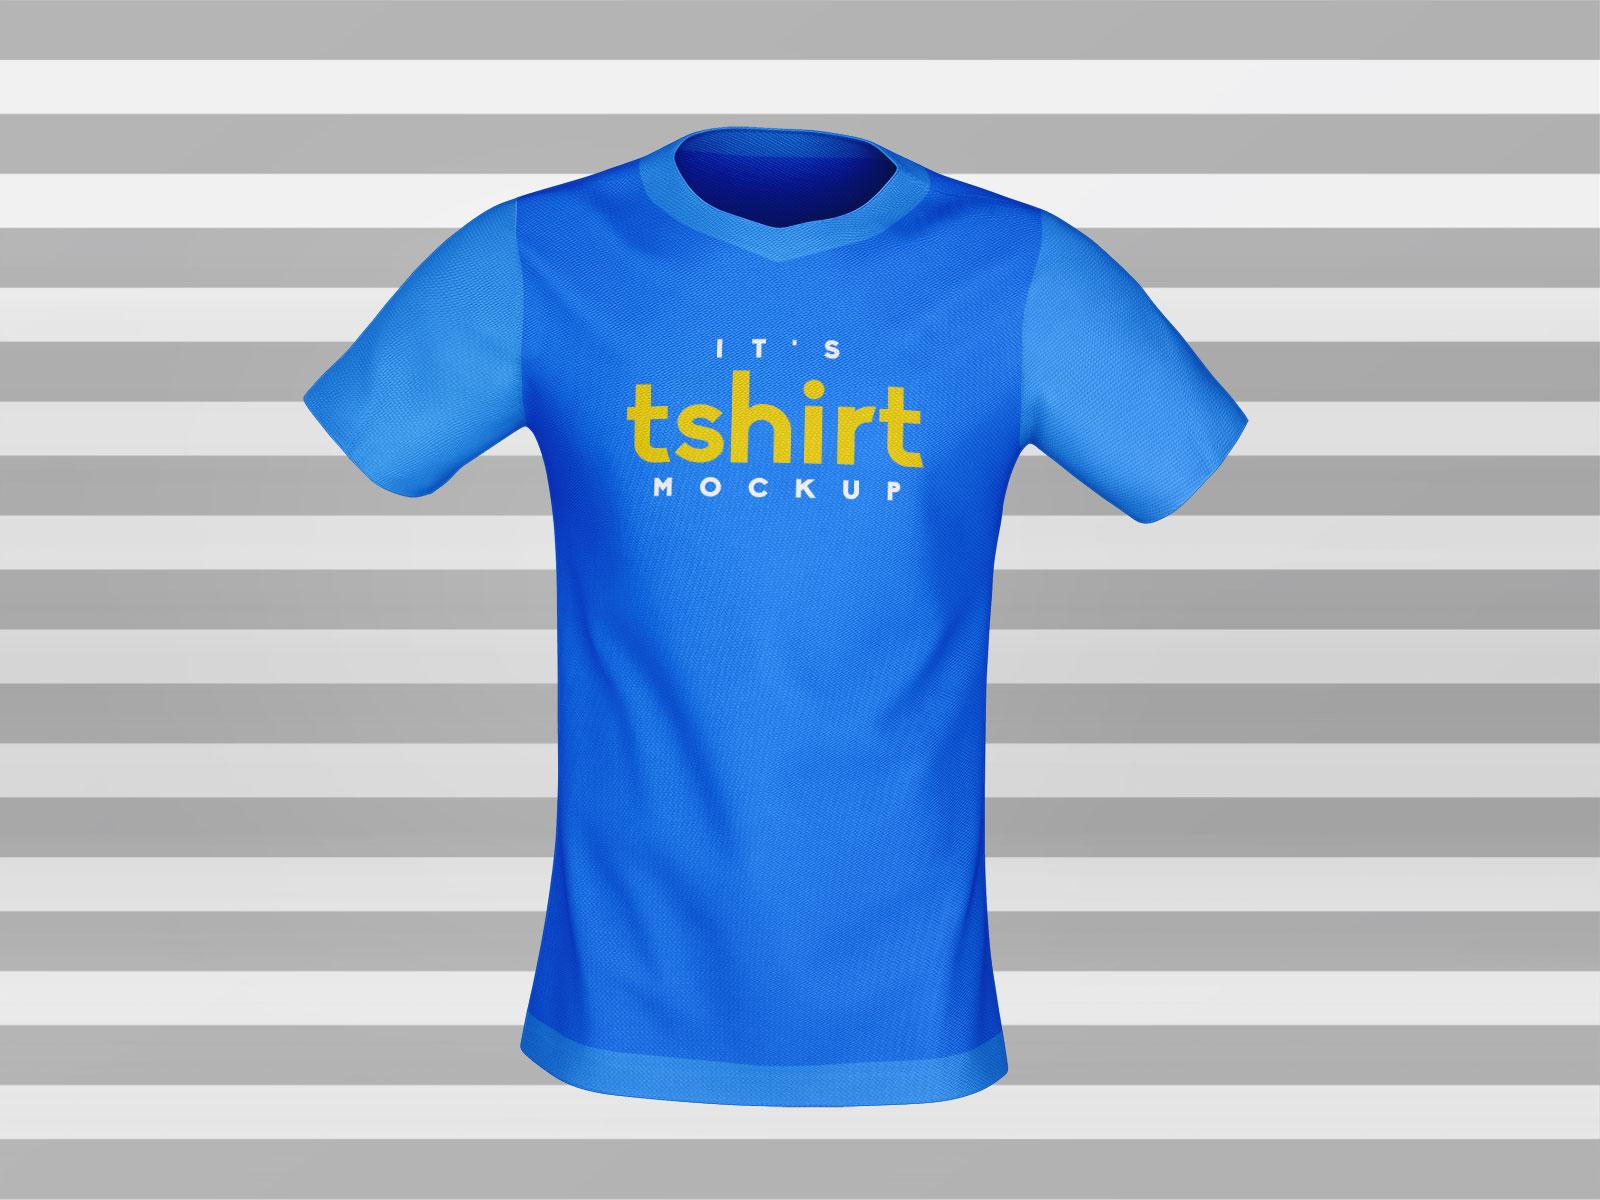 Free-3D-Rendered-Front-Back-T-Shirt-Mockup-PSD